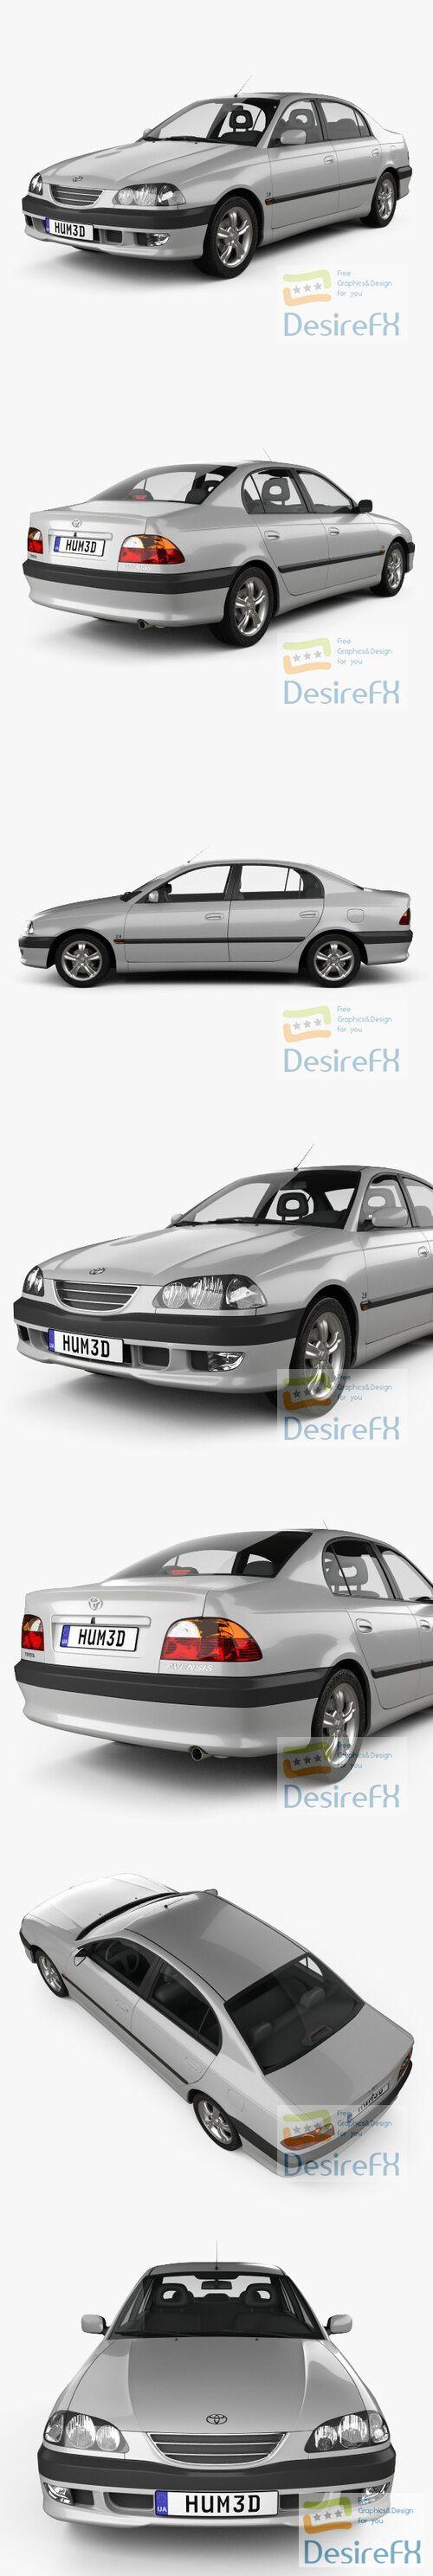 Toyota Avensis 1997 3D Model